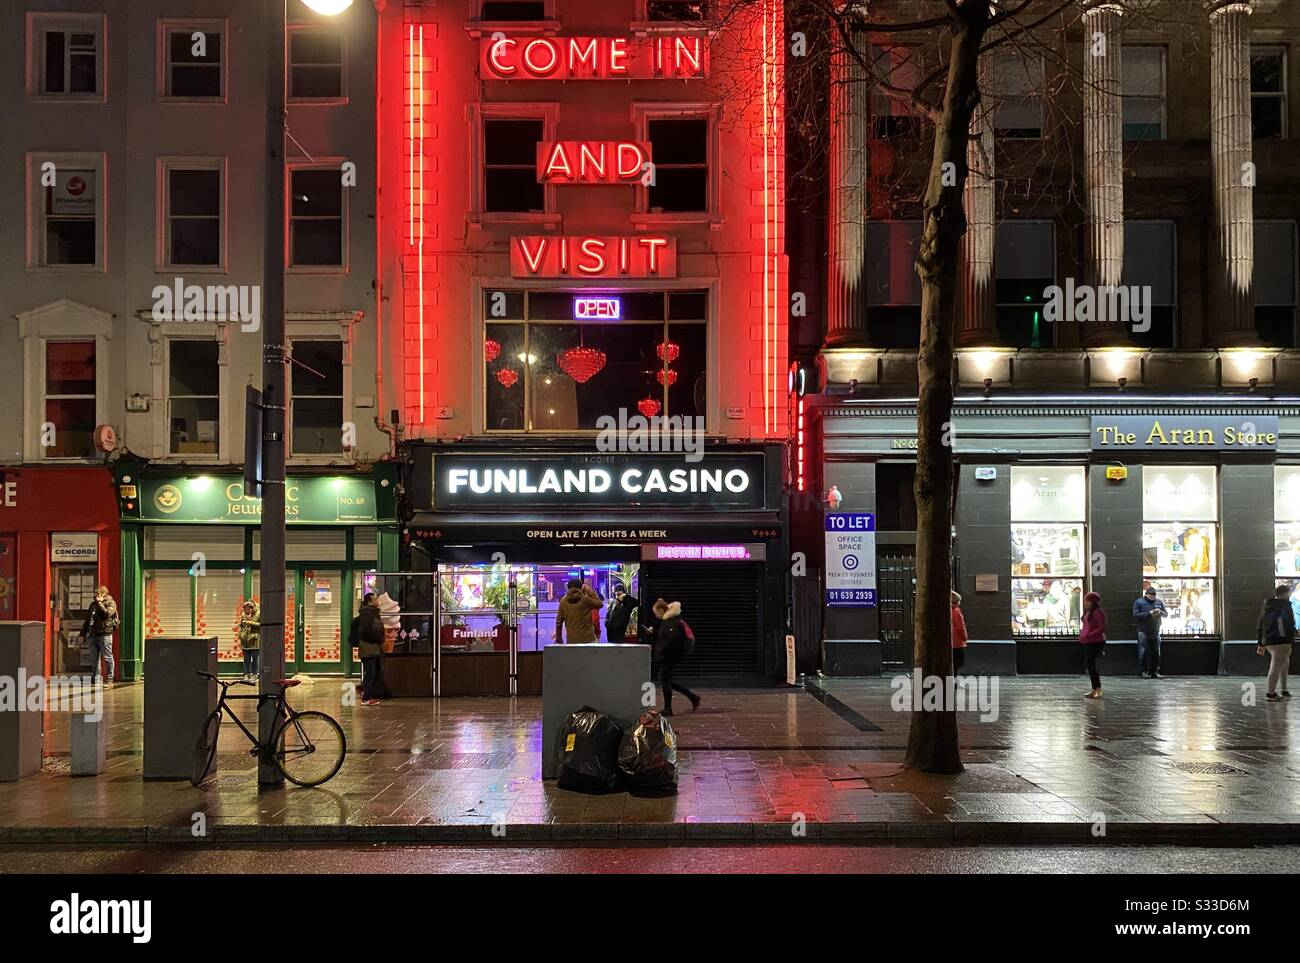 funland casino dublin